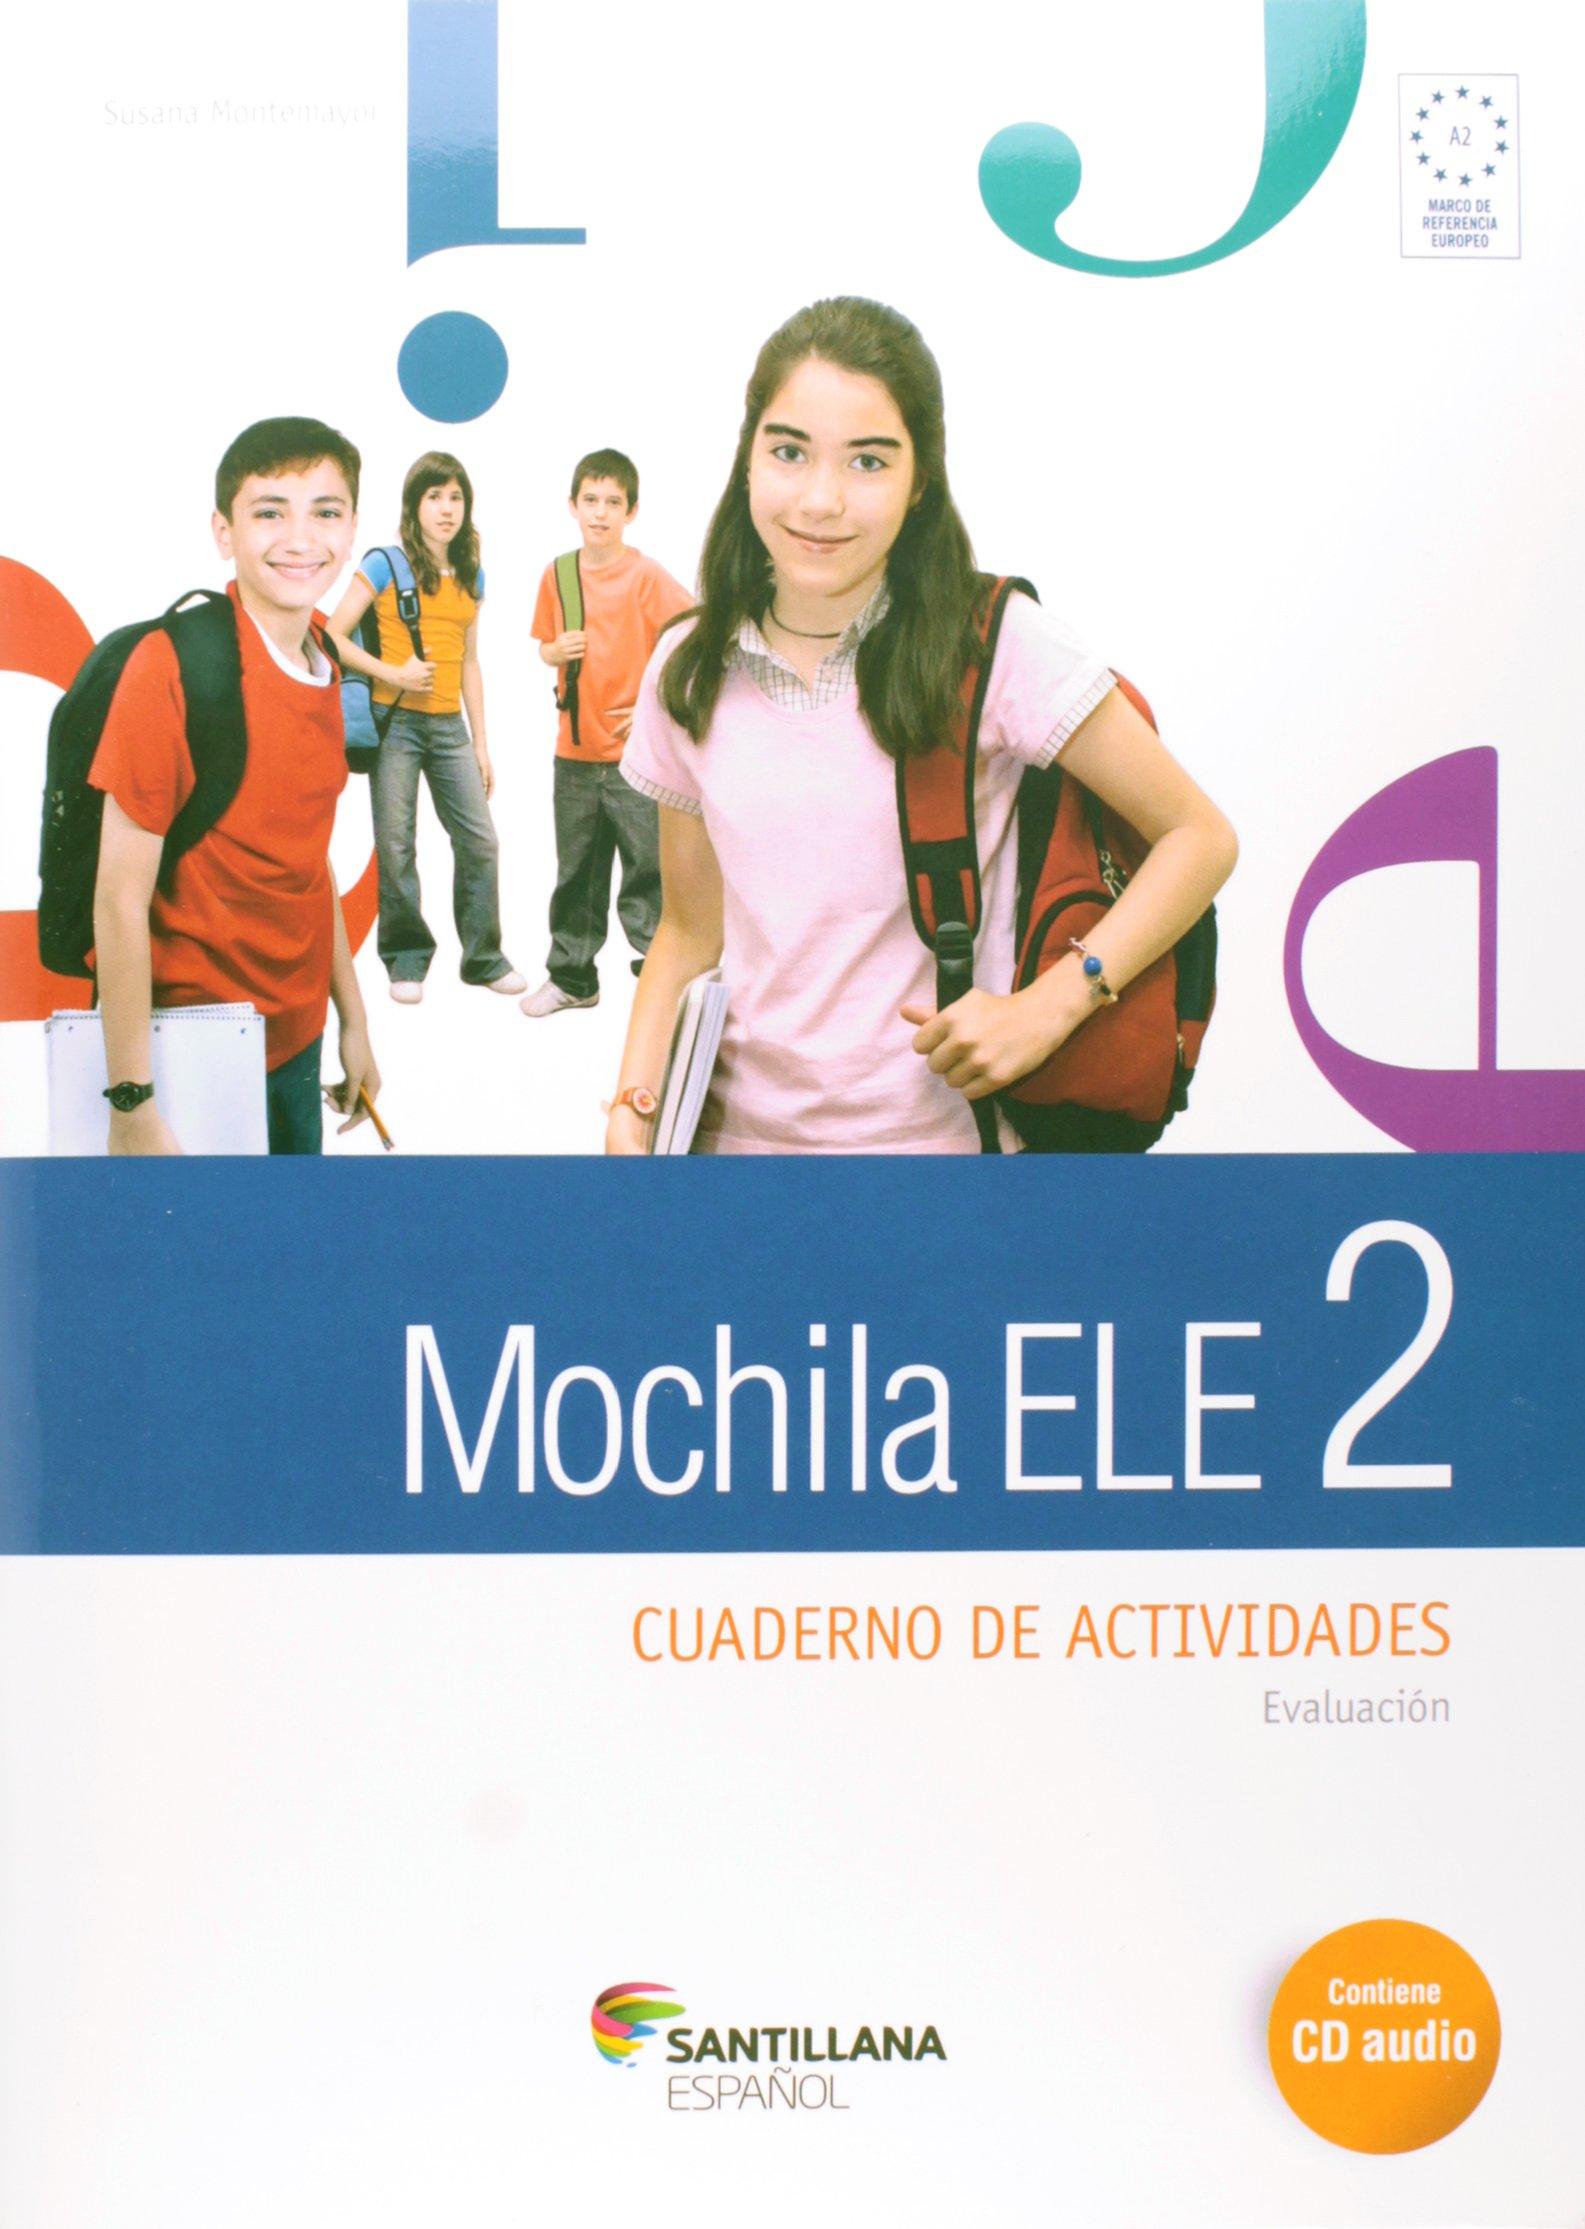 Mochila ELE 2. Actividades (Em Portuguese do Brasil) (Spanish) Paperback